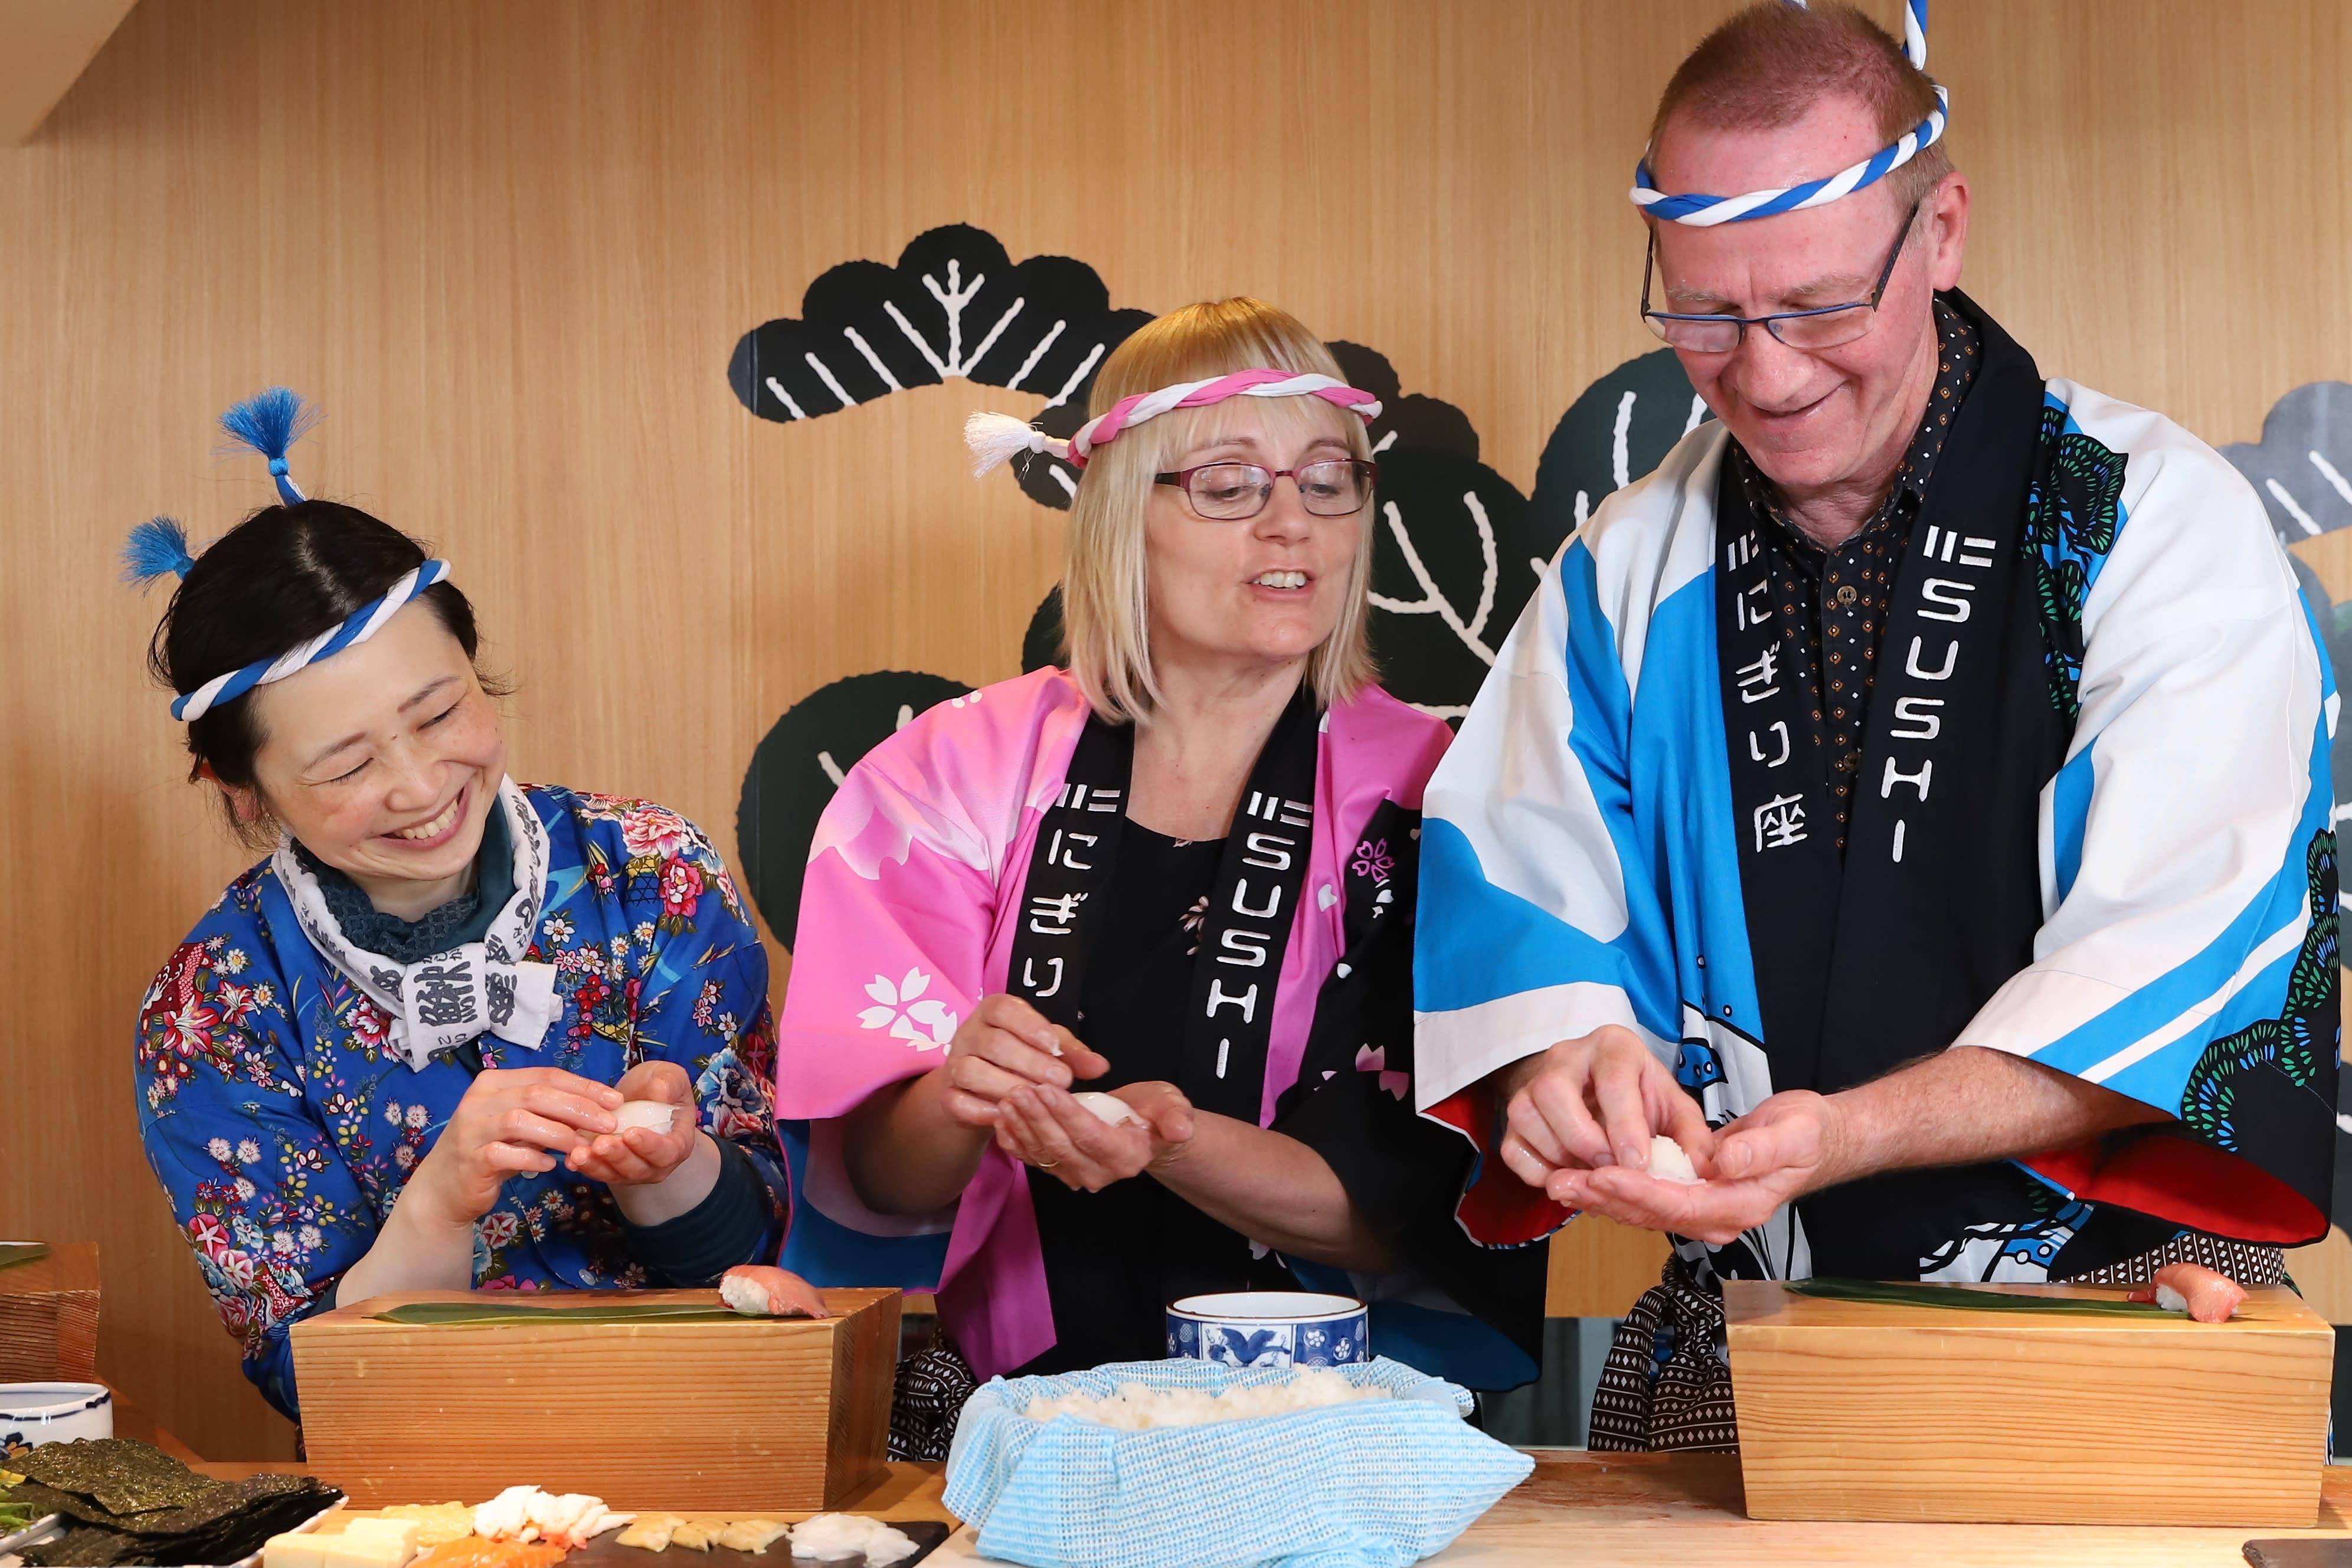 Hiroshima Sushi Making Experience Wearing Happi & Hachimaki